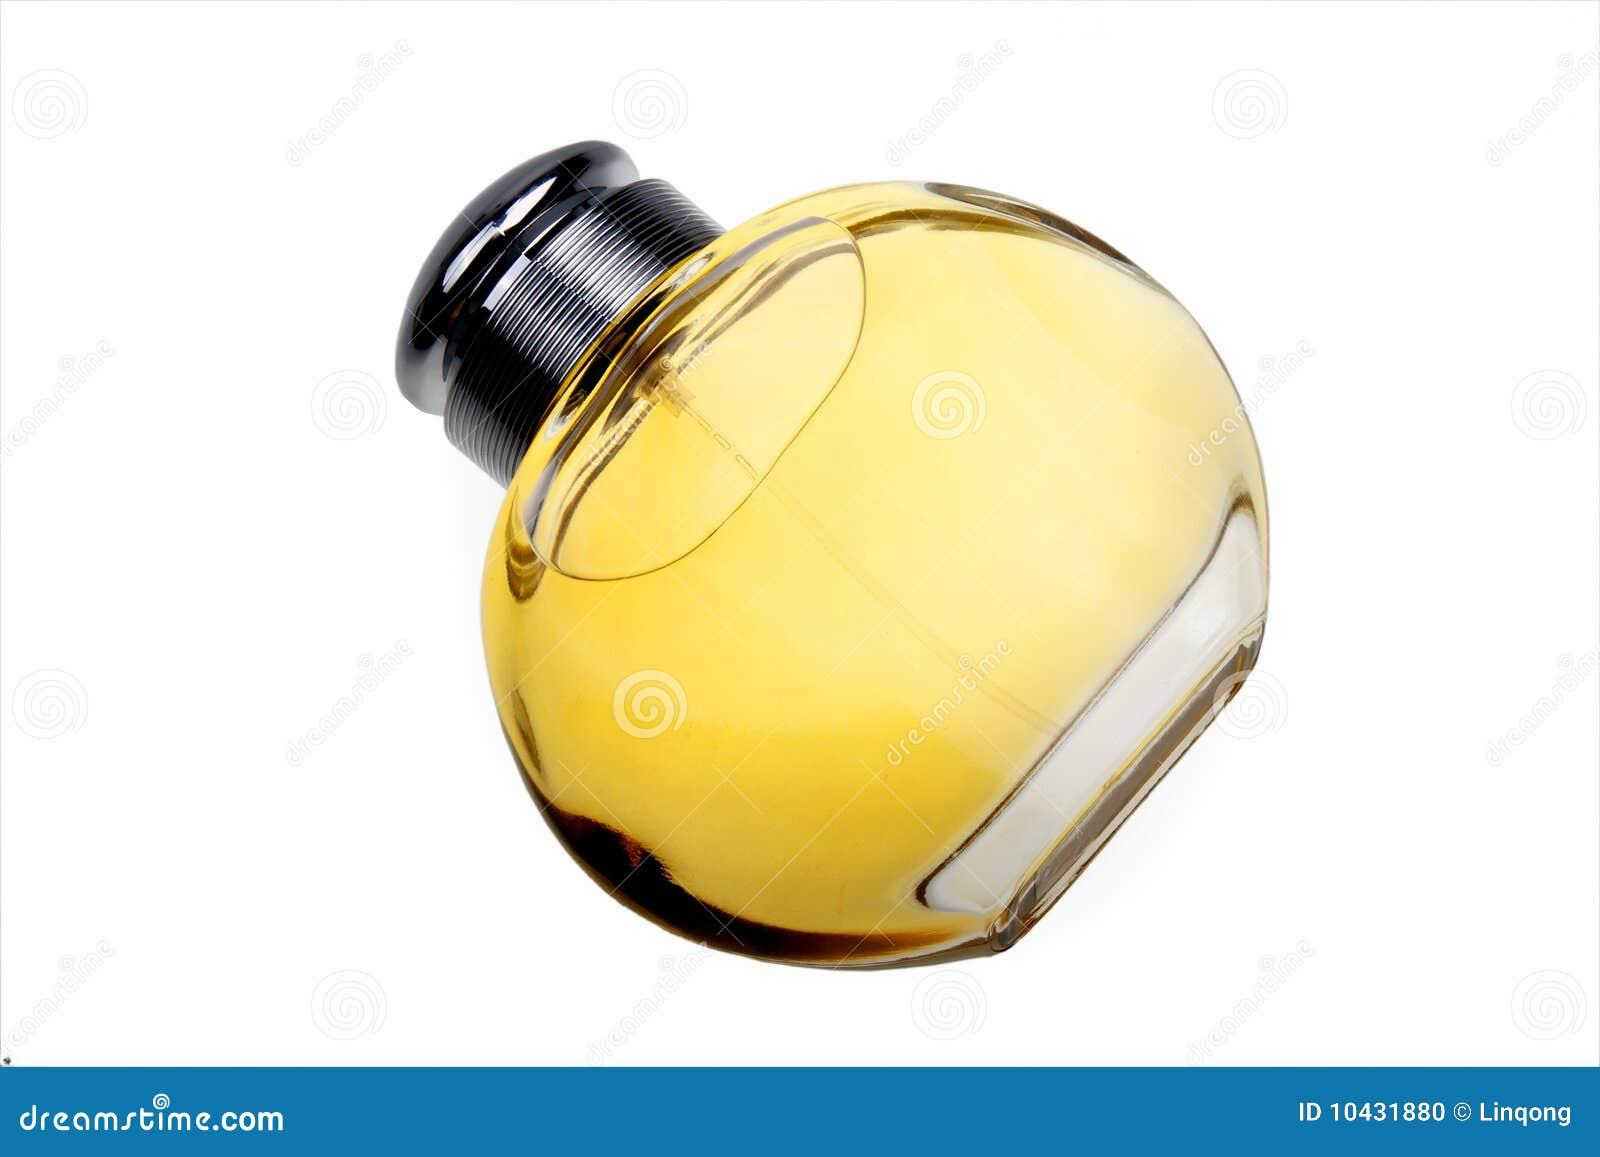 Bottle of top grade perfume on white background